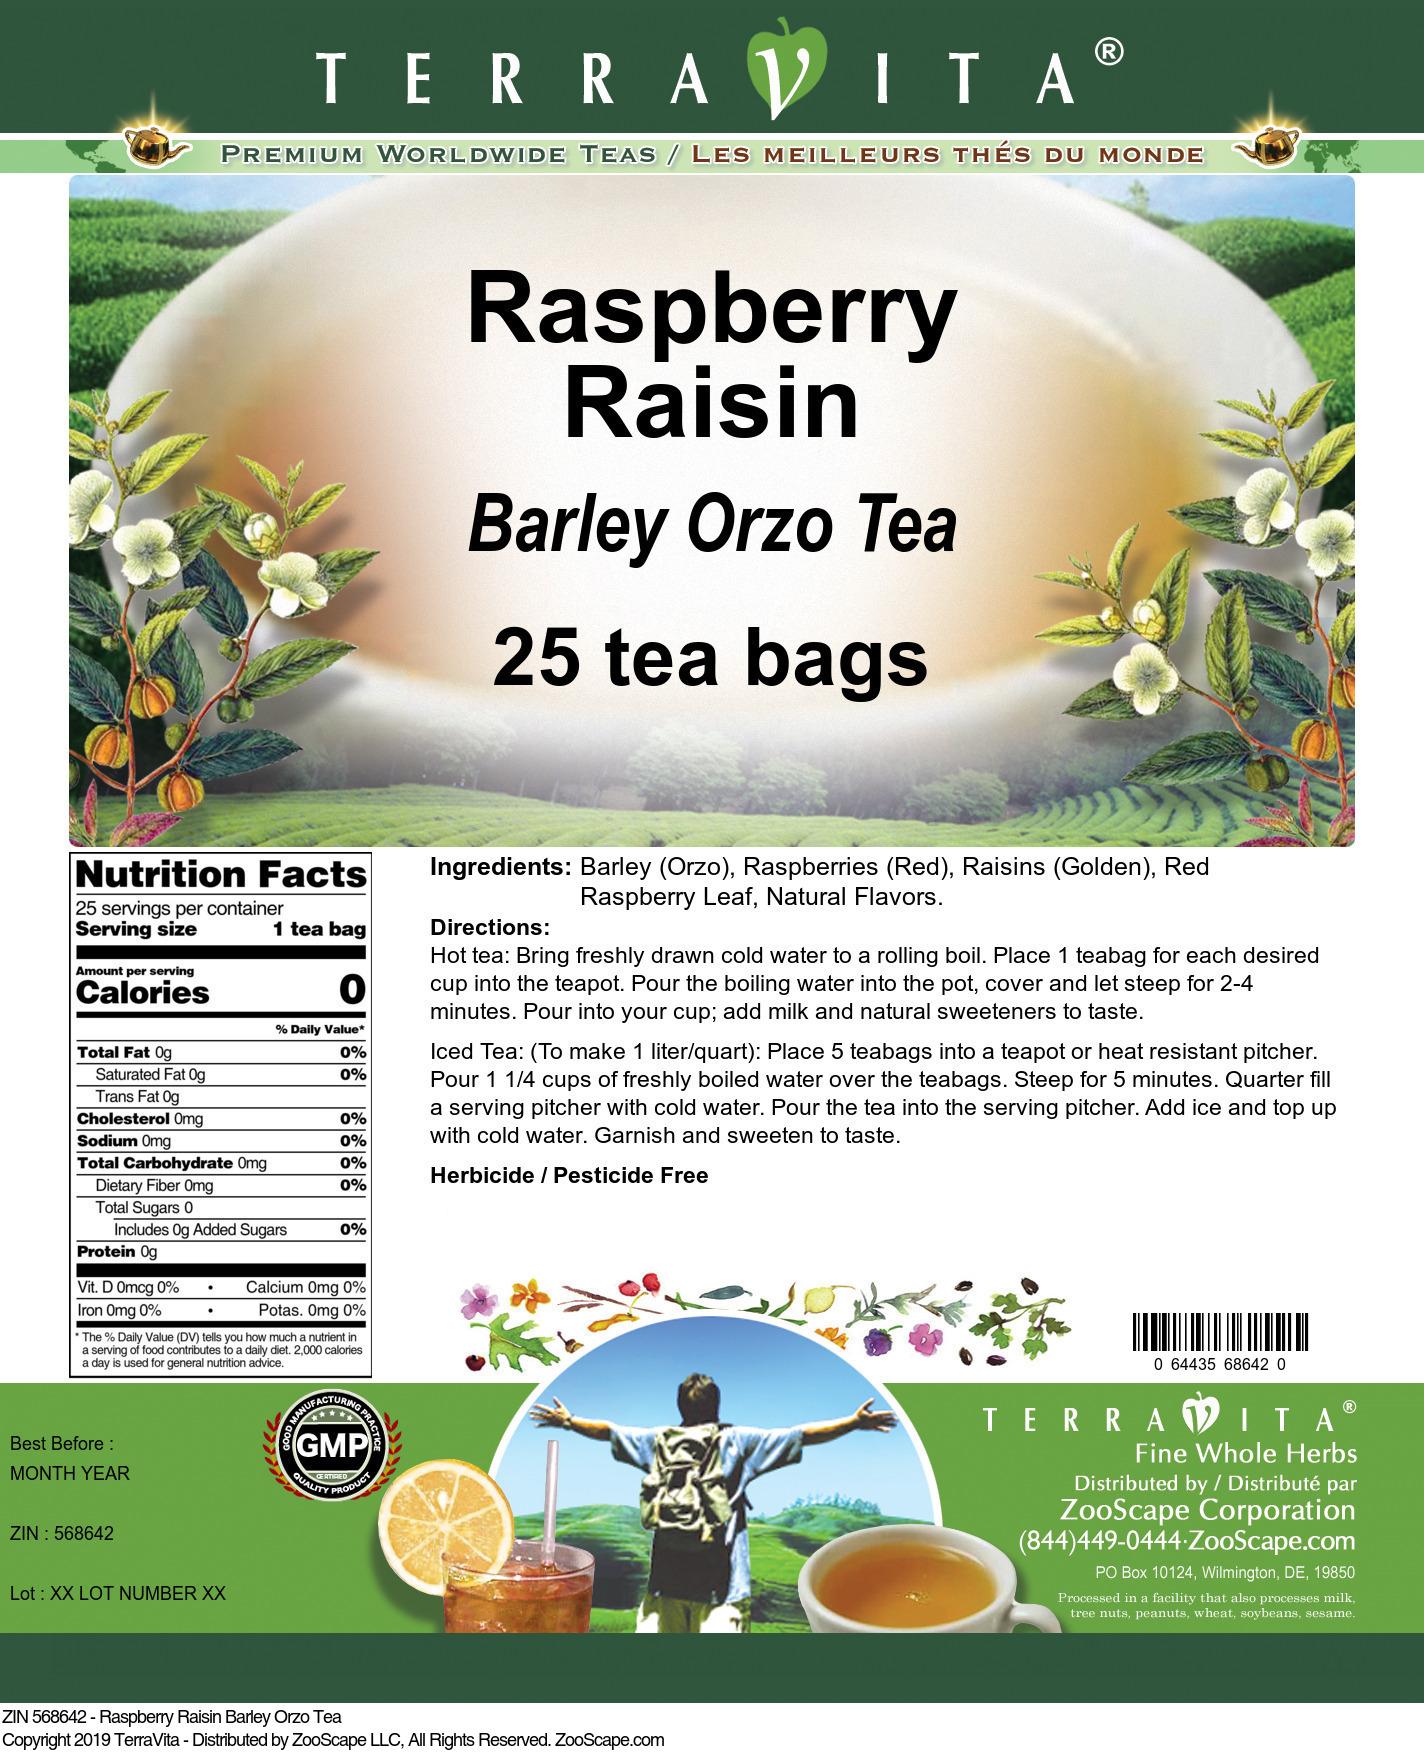 Raspberry Raisin Barley Orzo Tea